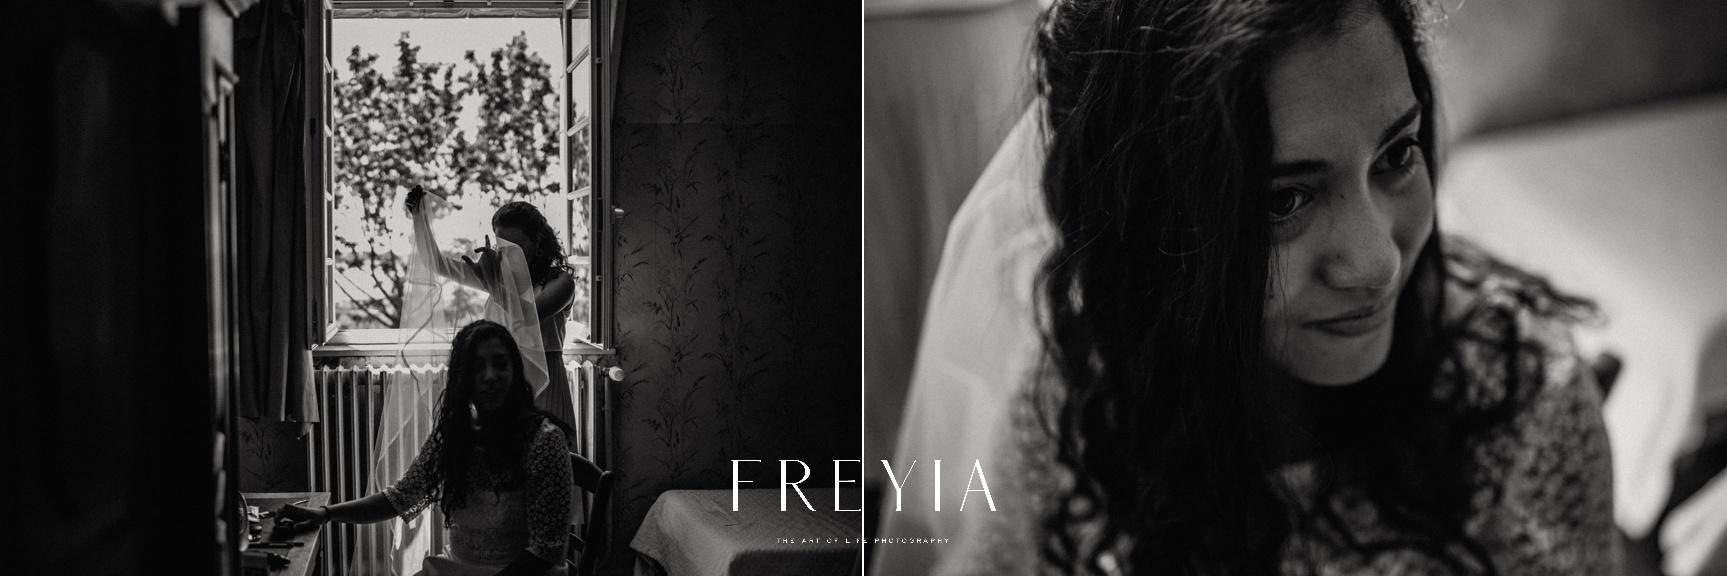 R + T |  mariage reportage alternatif moody intime minimaliste vintage naturel boho boheme |  PHOTOGRAPHE mariage PARIS france destination  | FREYIA photography_-101.jpg